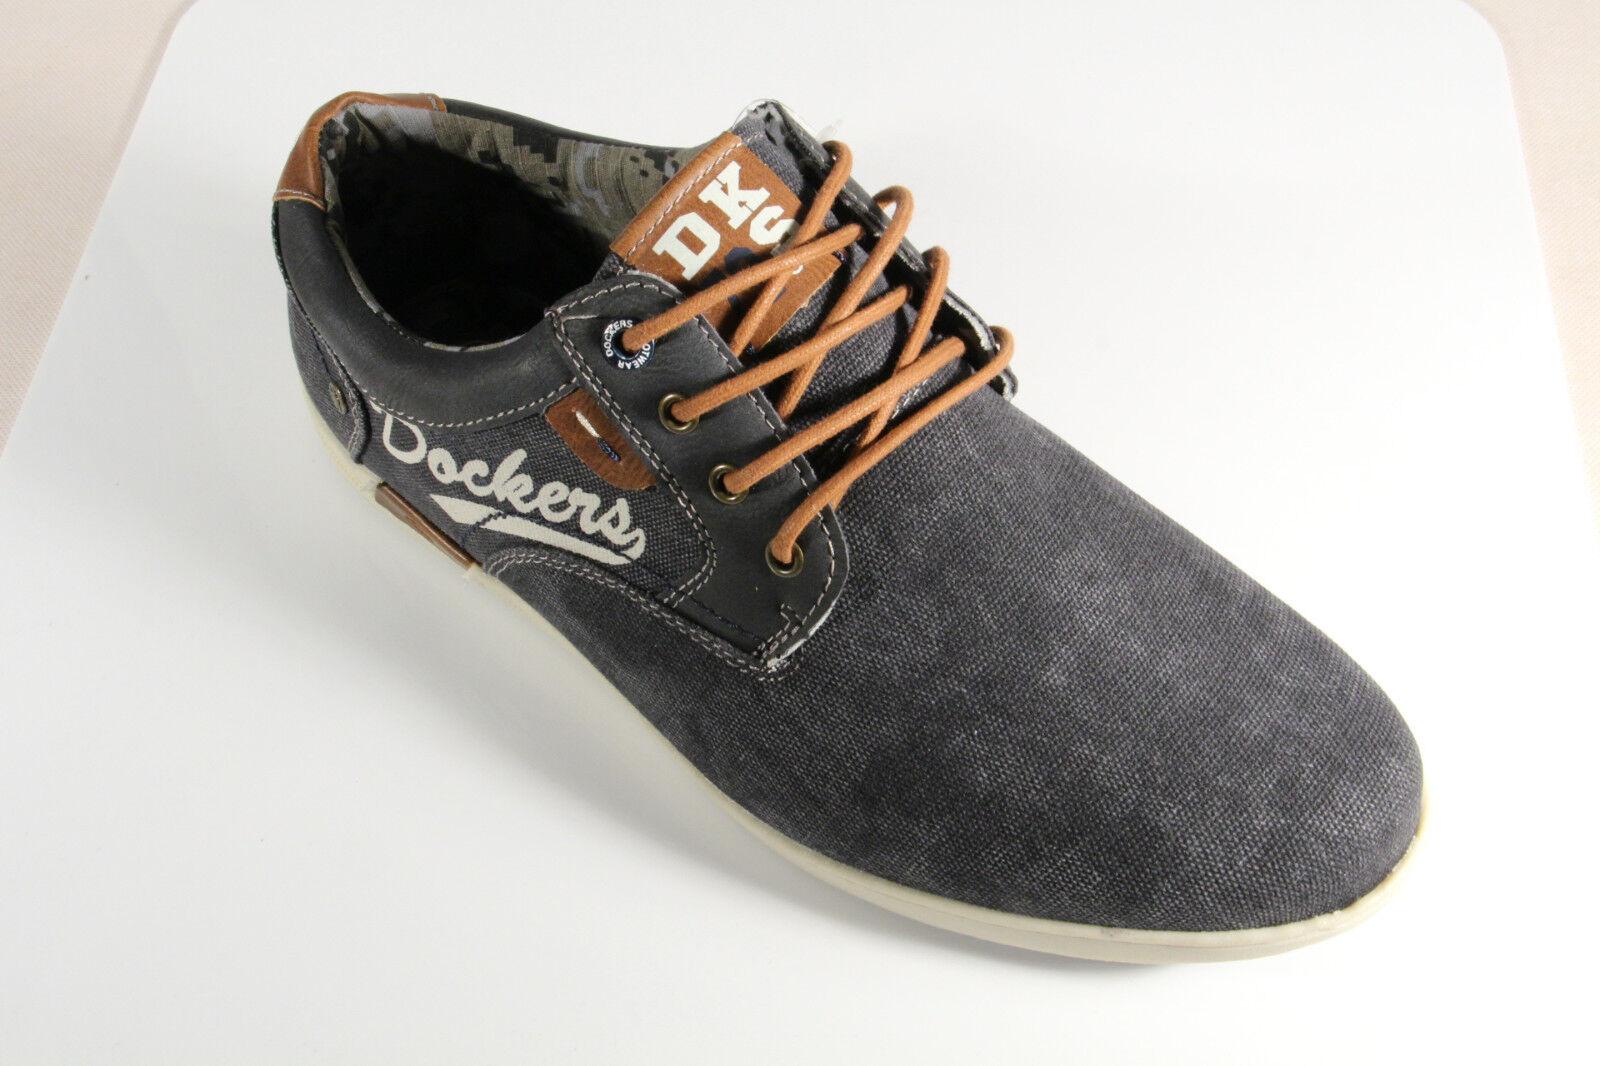 NEU Dockers Herrenschuhe Schuhe Canvas Sneaker Halbschuhe Slipper Schnürschuhe